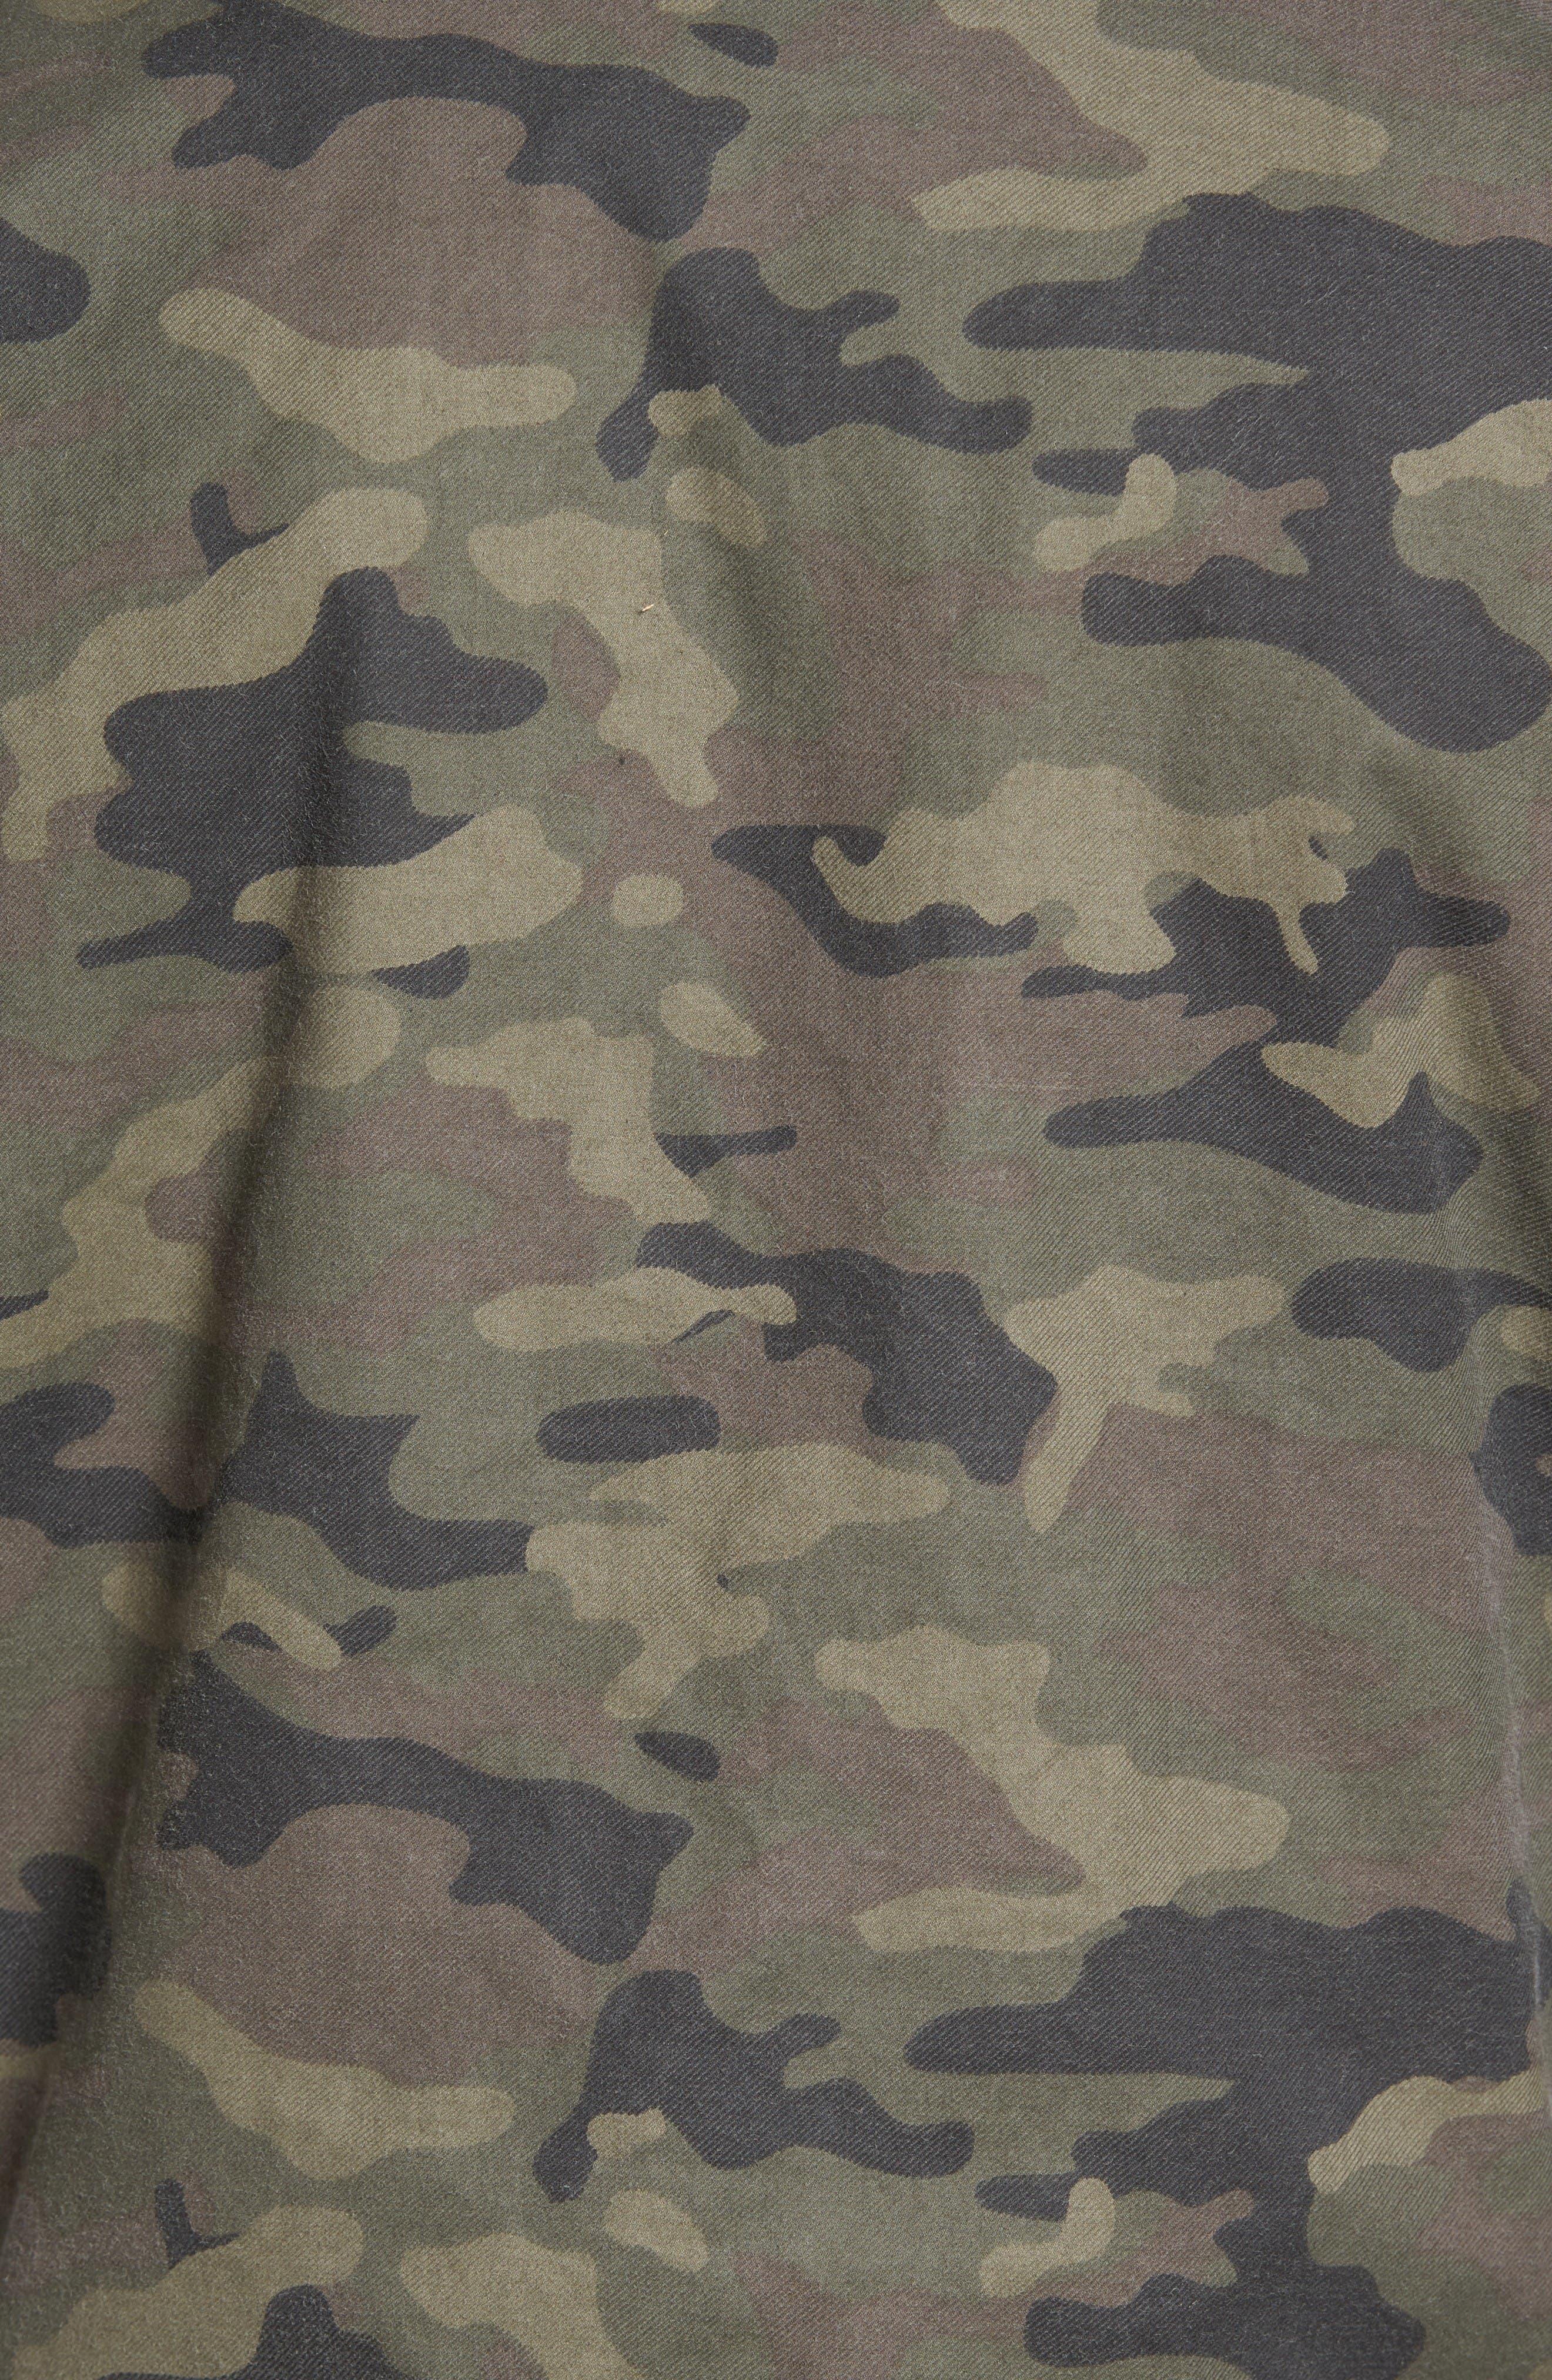 Knox Twill Bomber Jacket,                             Alternate thumbnail 5, color,                             Infantry Camo